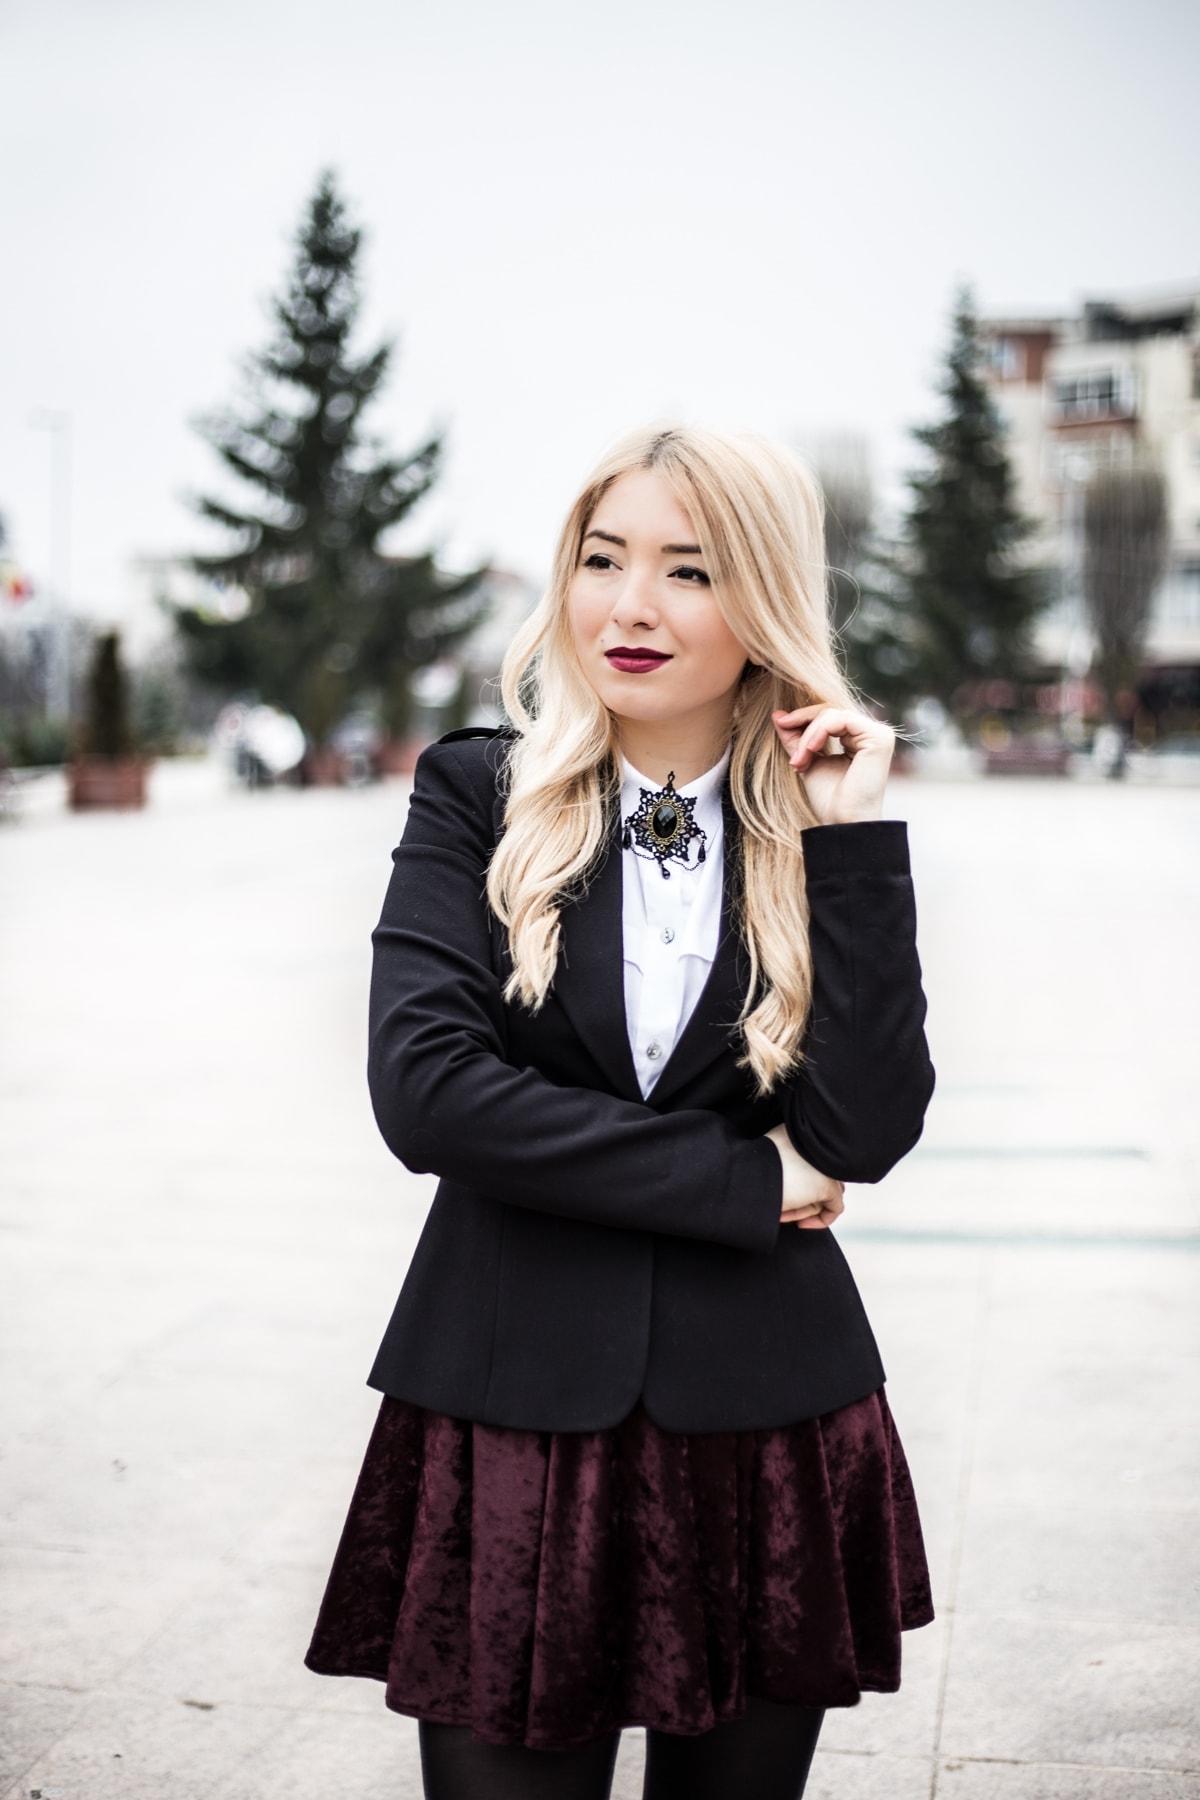 Andreea Pantilinescu